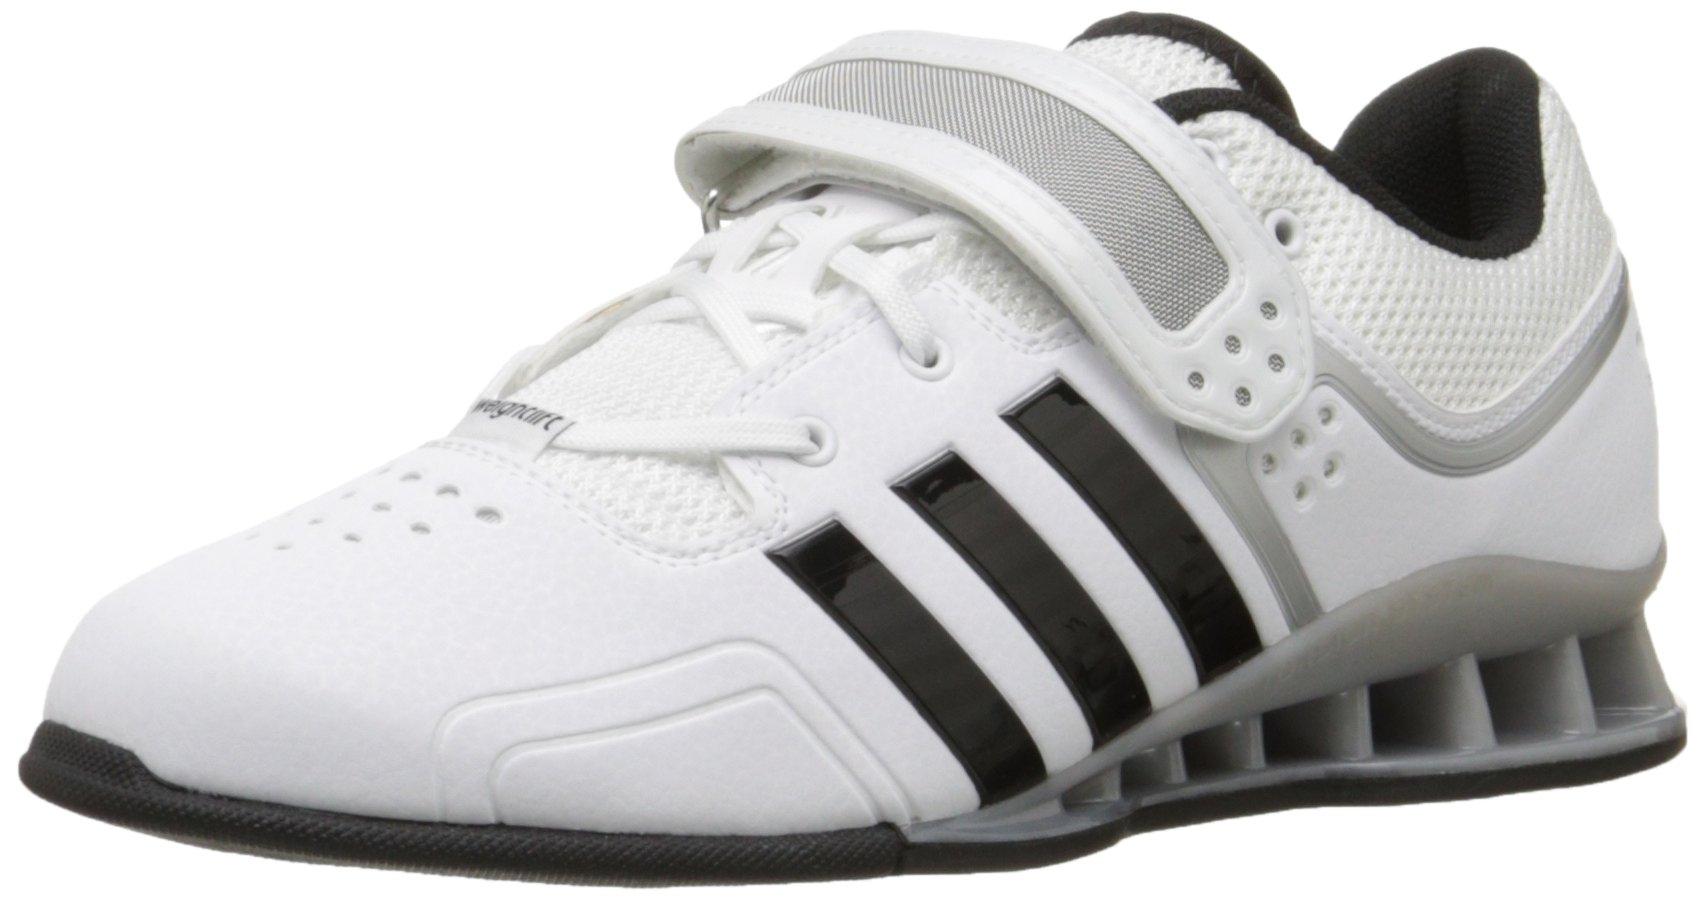 adidas Performance Adipower Weightlifting Trainer Shoe,White/Black/Tech Grey,10 M US